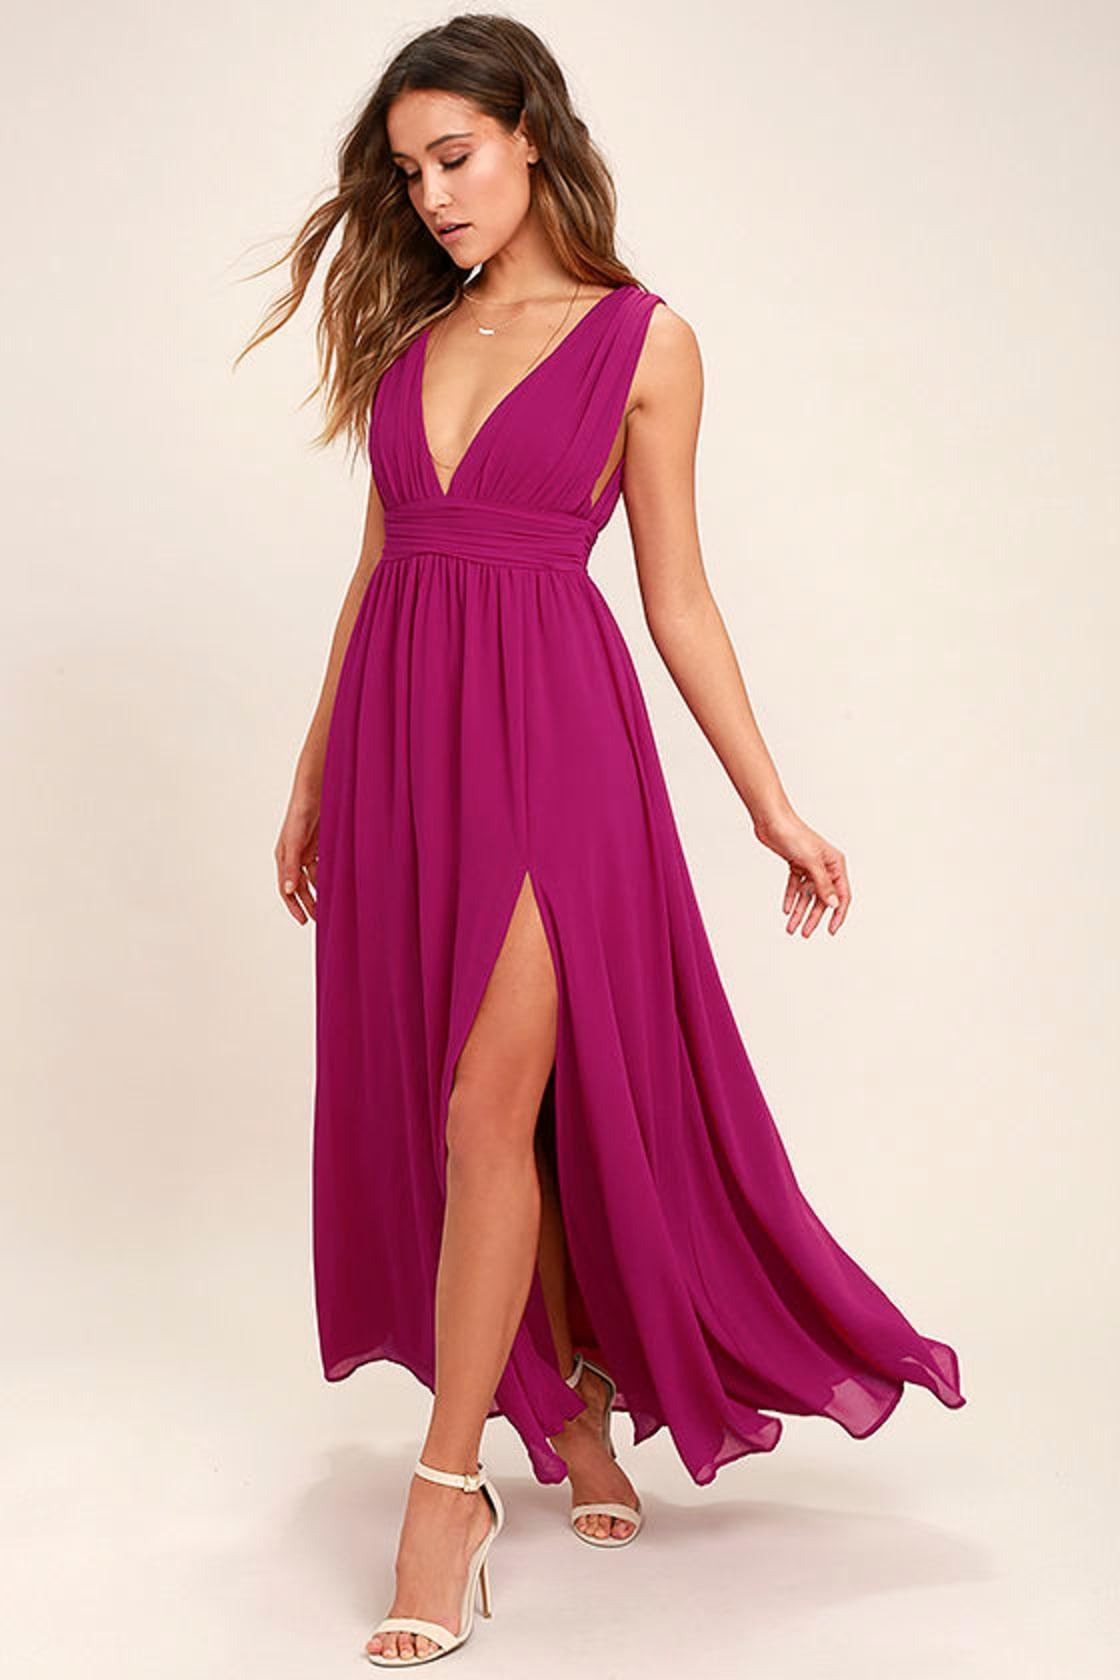 Heavenly Hues Magenta Maxi Dress